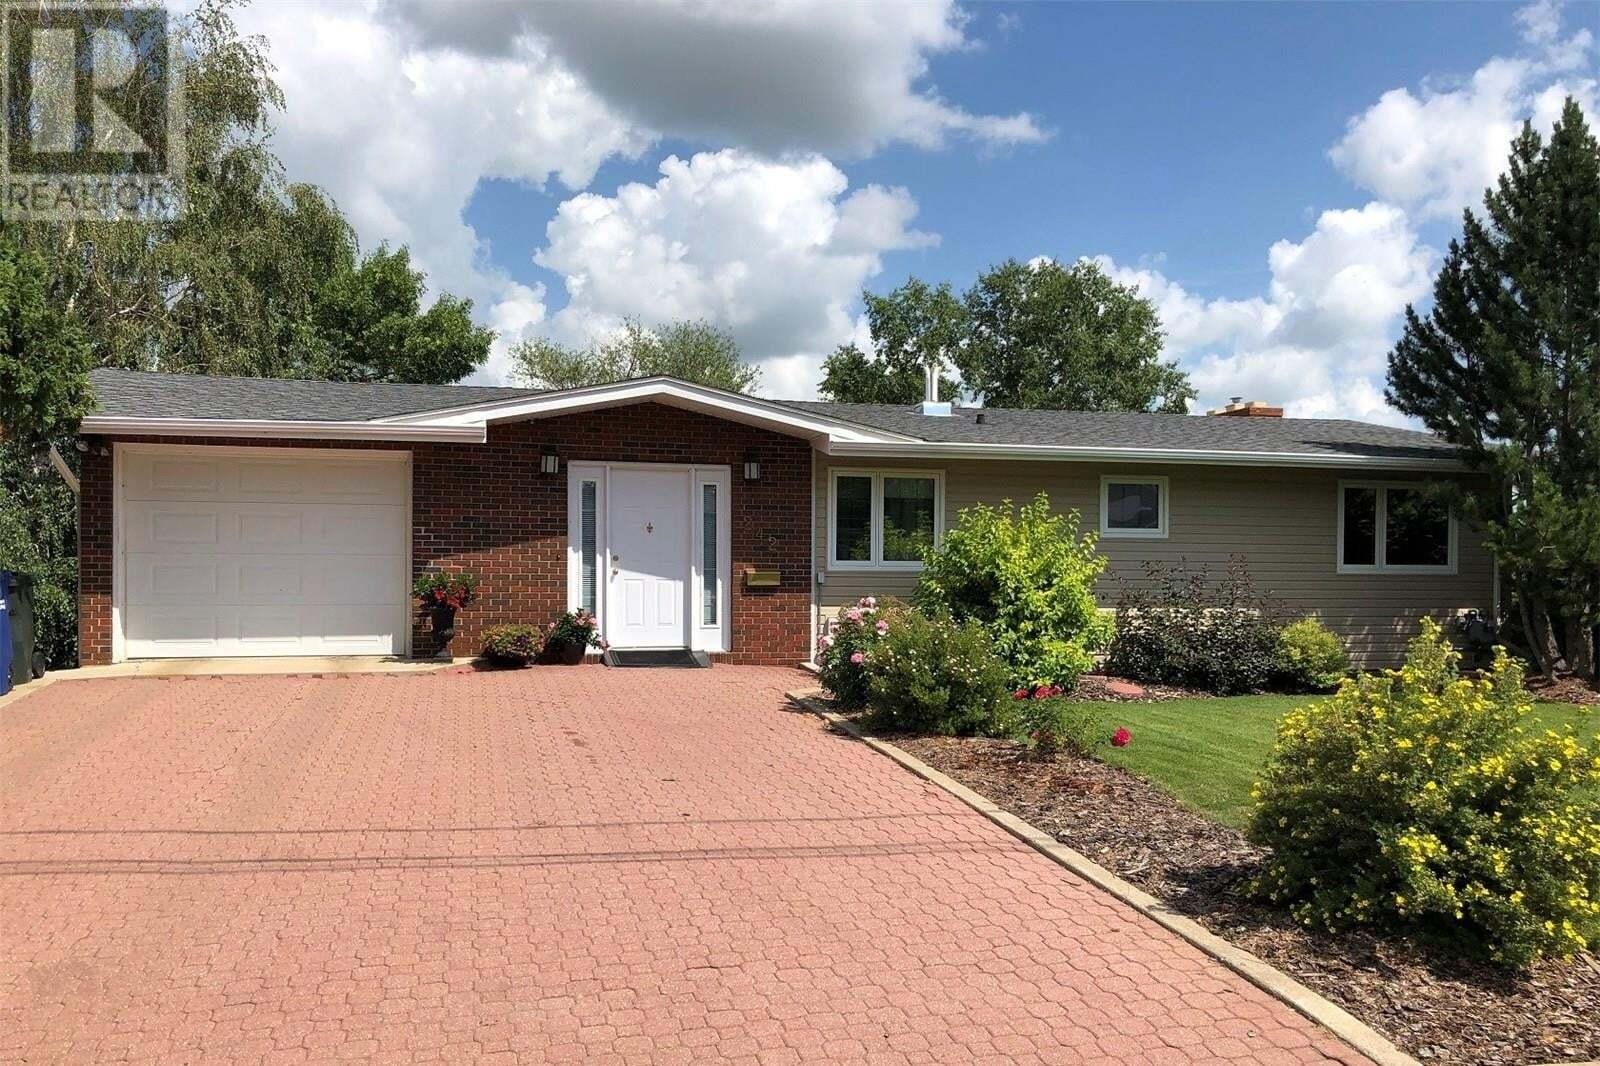 House for sale at 242 34th St Battleford Saskatchewan - MLS: SK819273